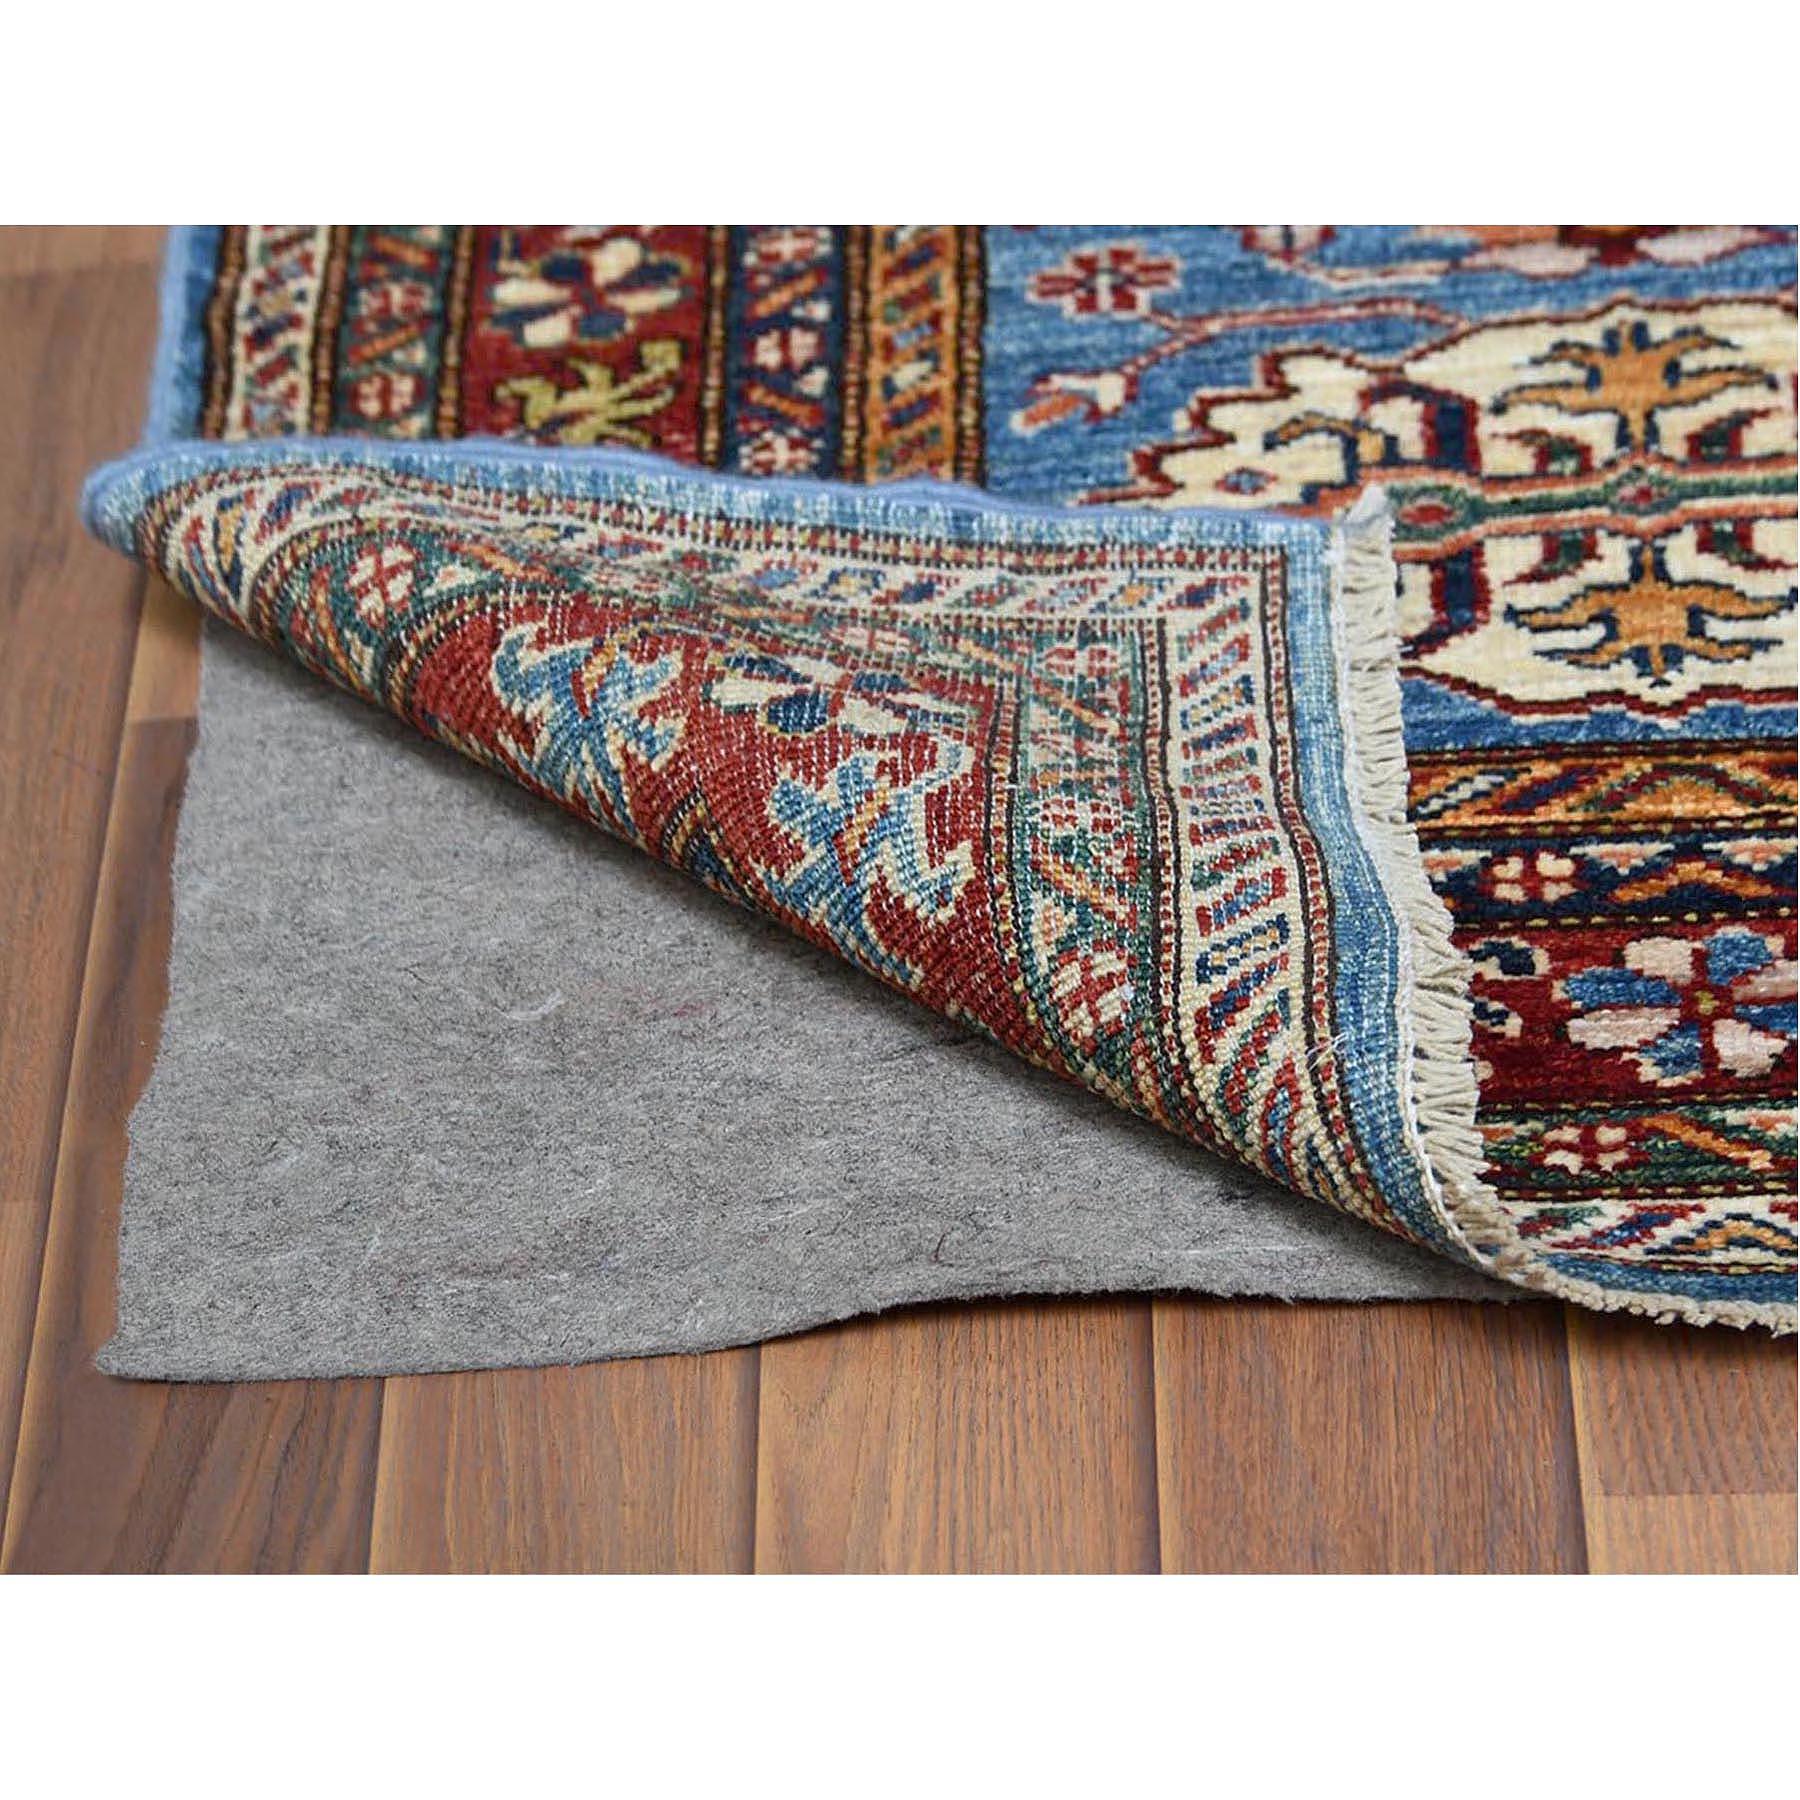 "2'7""x8'5"" Blue Super Kazak Nomadic Design Herbal Wash Vibrant Wool Hand Knotted Oriental Runner Rug"